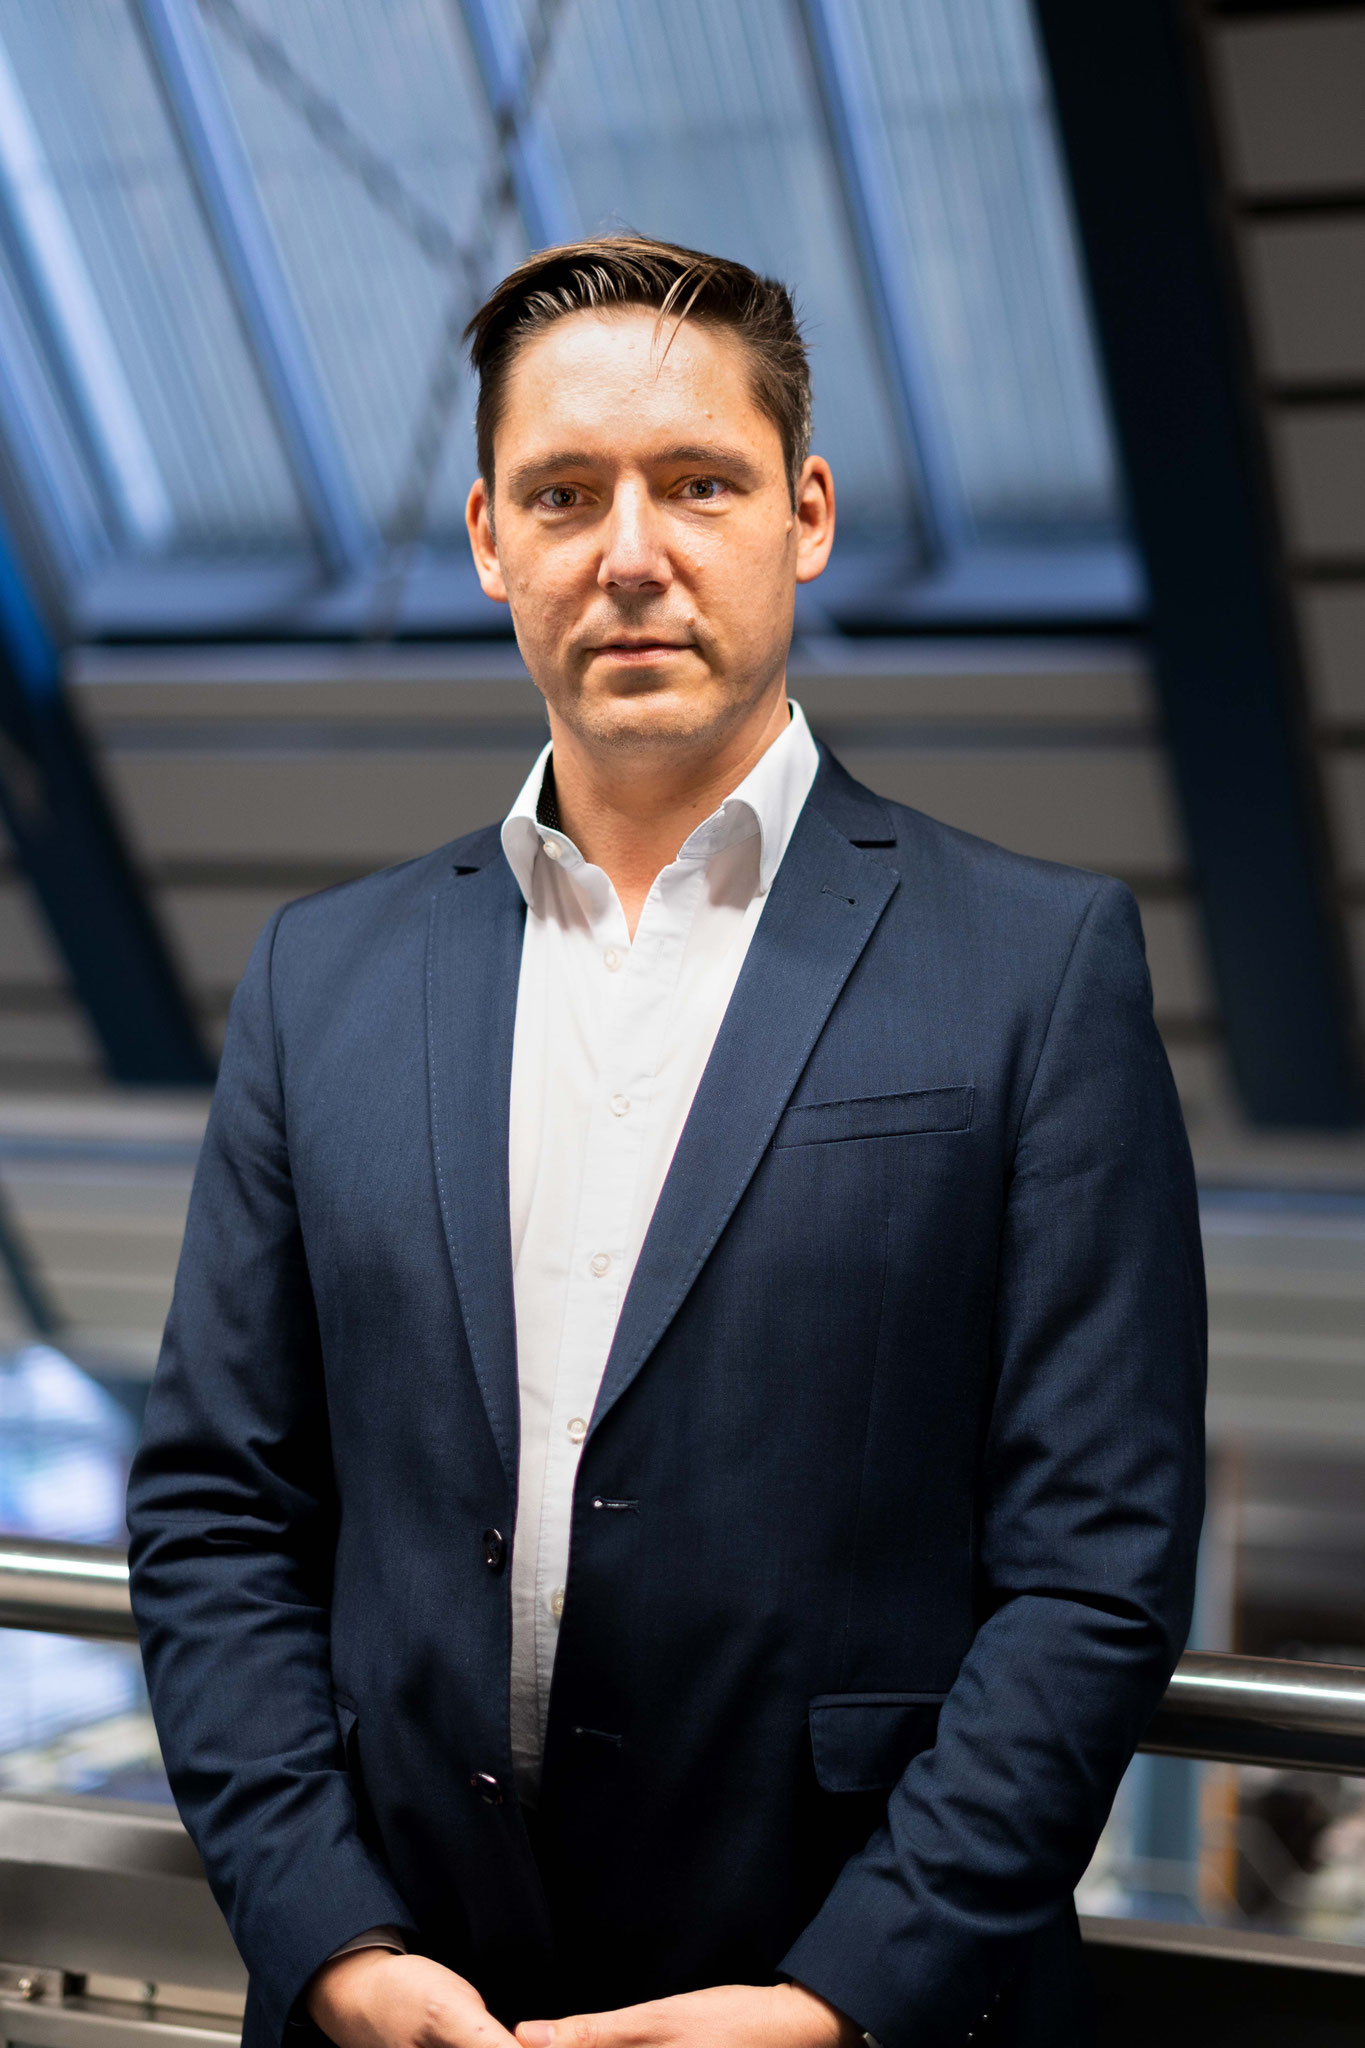 Prof. Dr. Matthias Busch